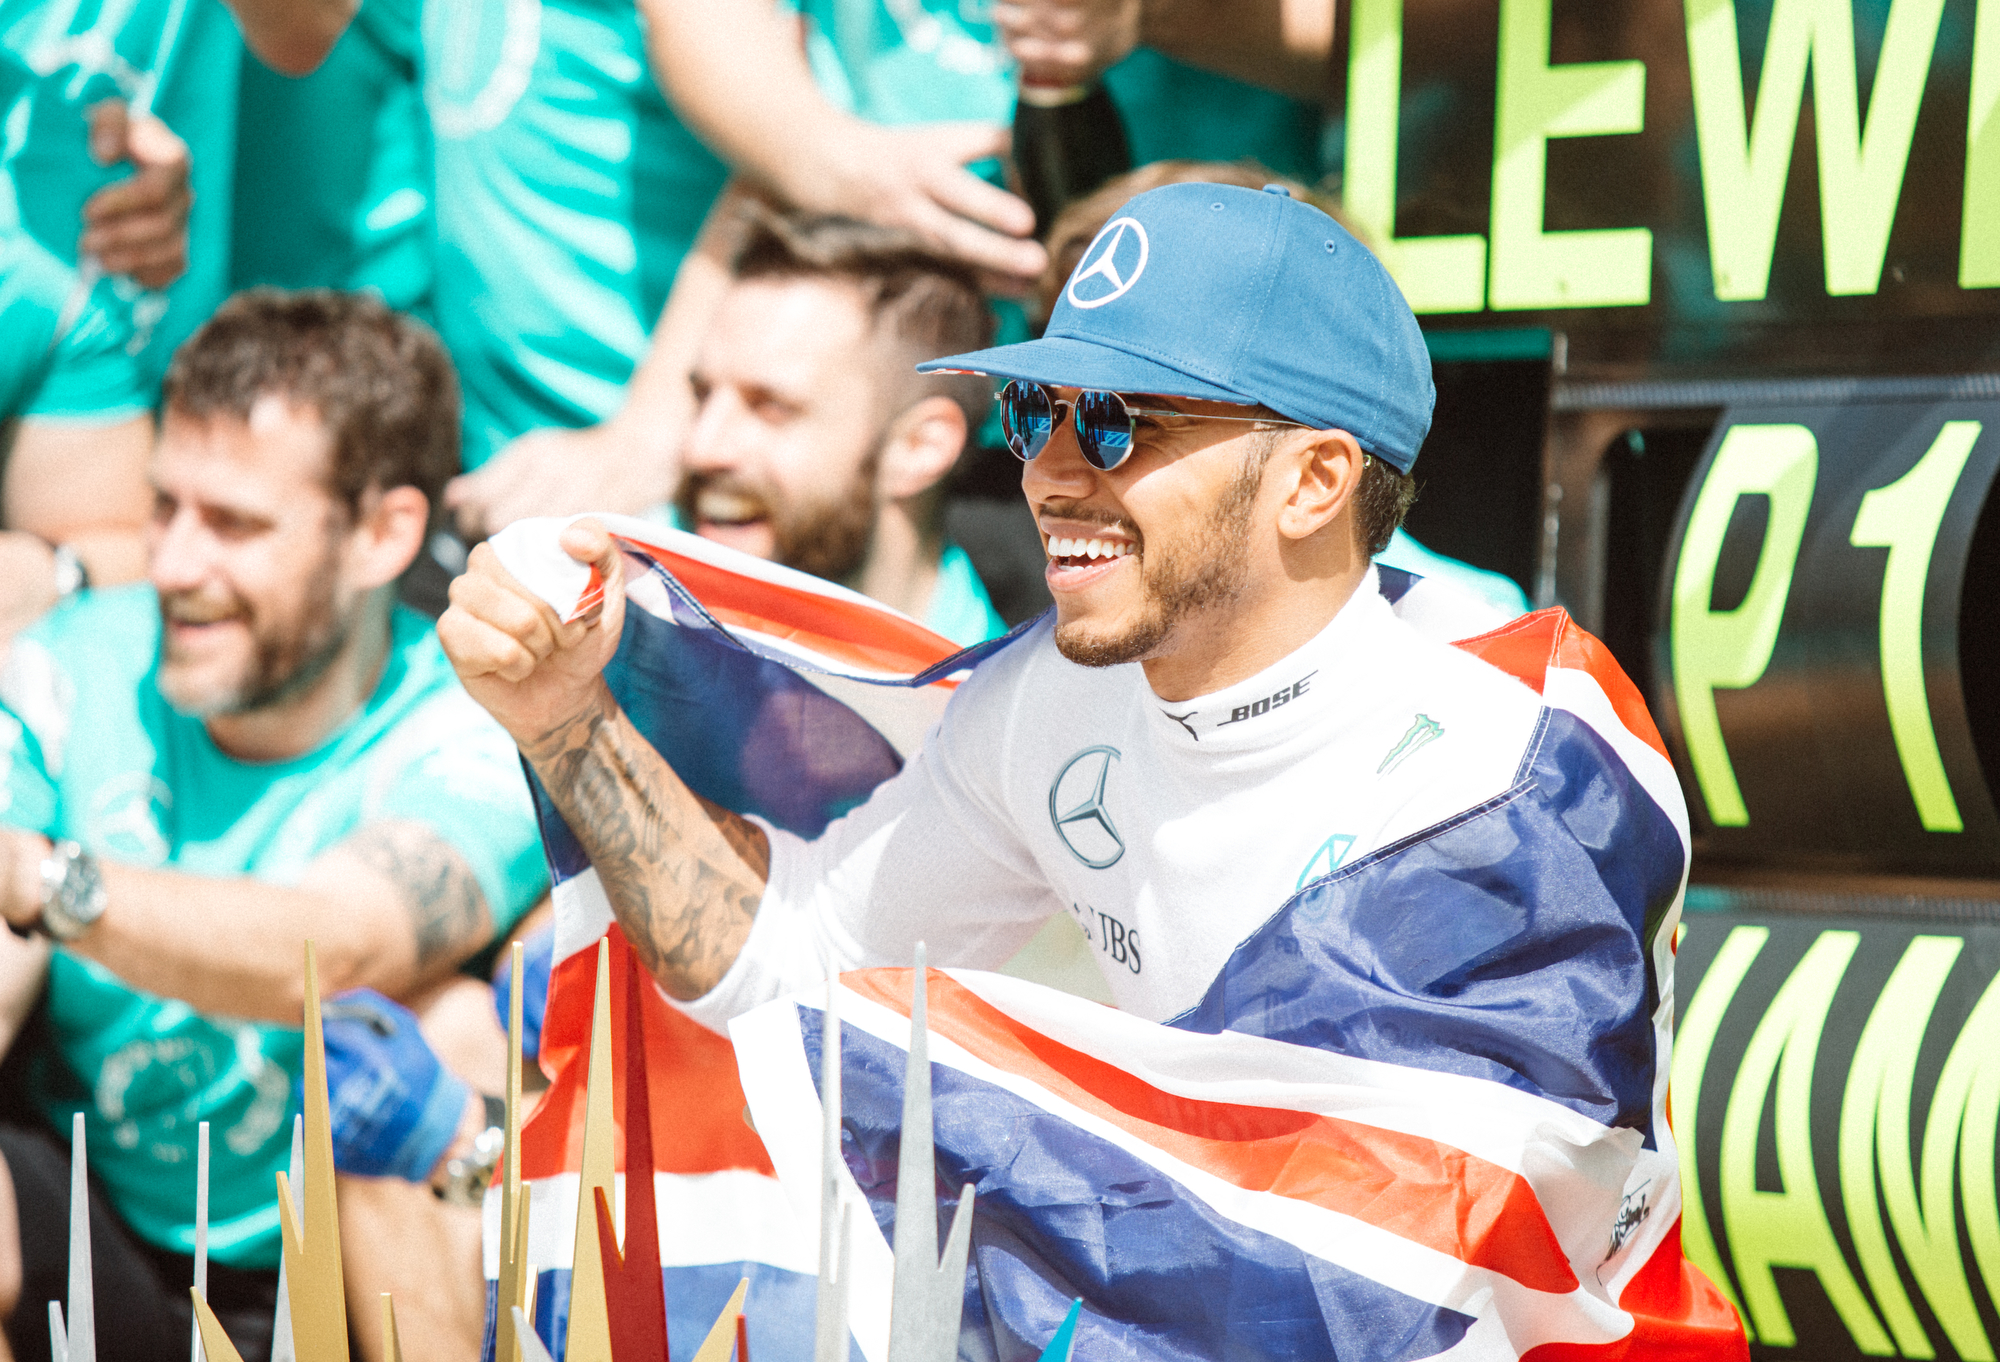 Lewis Hamilton, Mercedes. 2016 FIA Formula 1 Championship, Silverstone, UK.